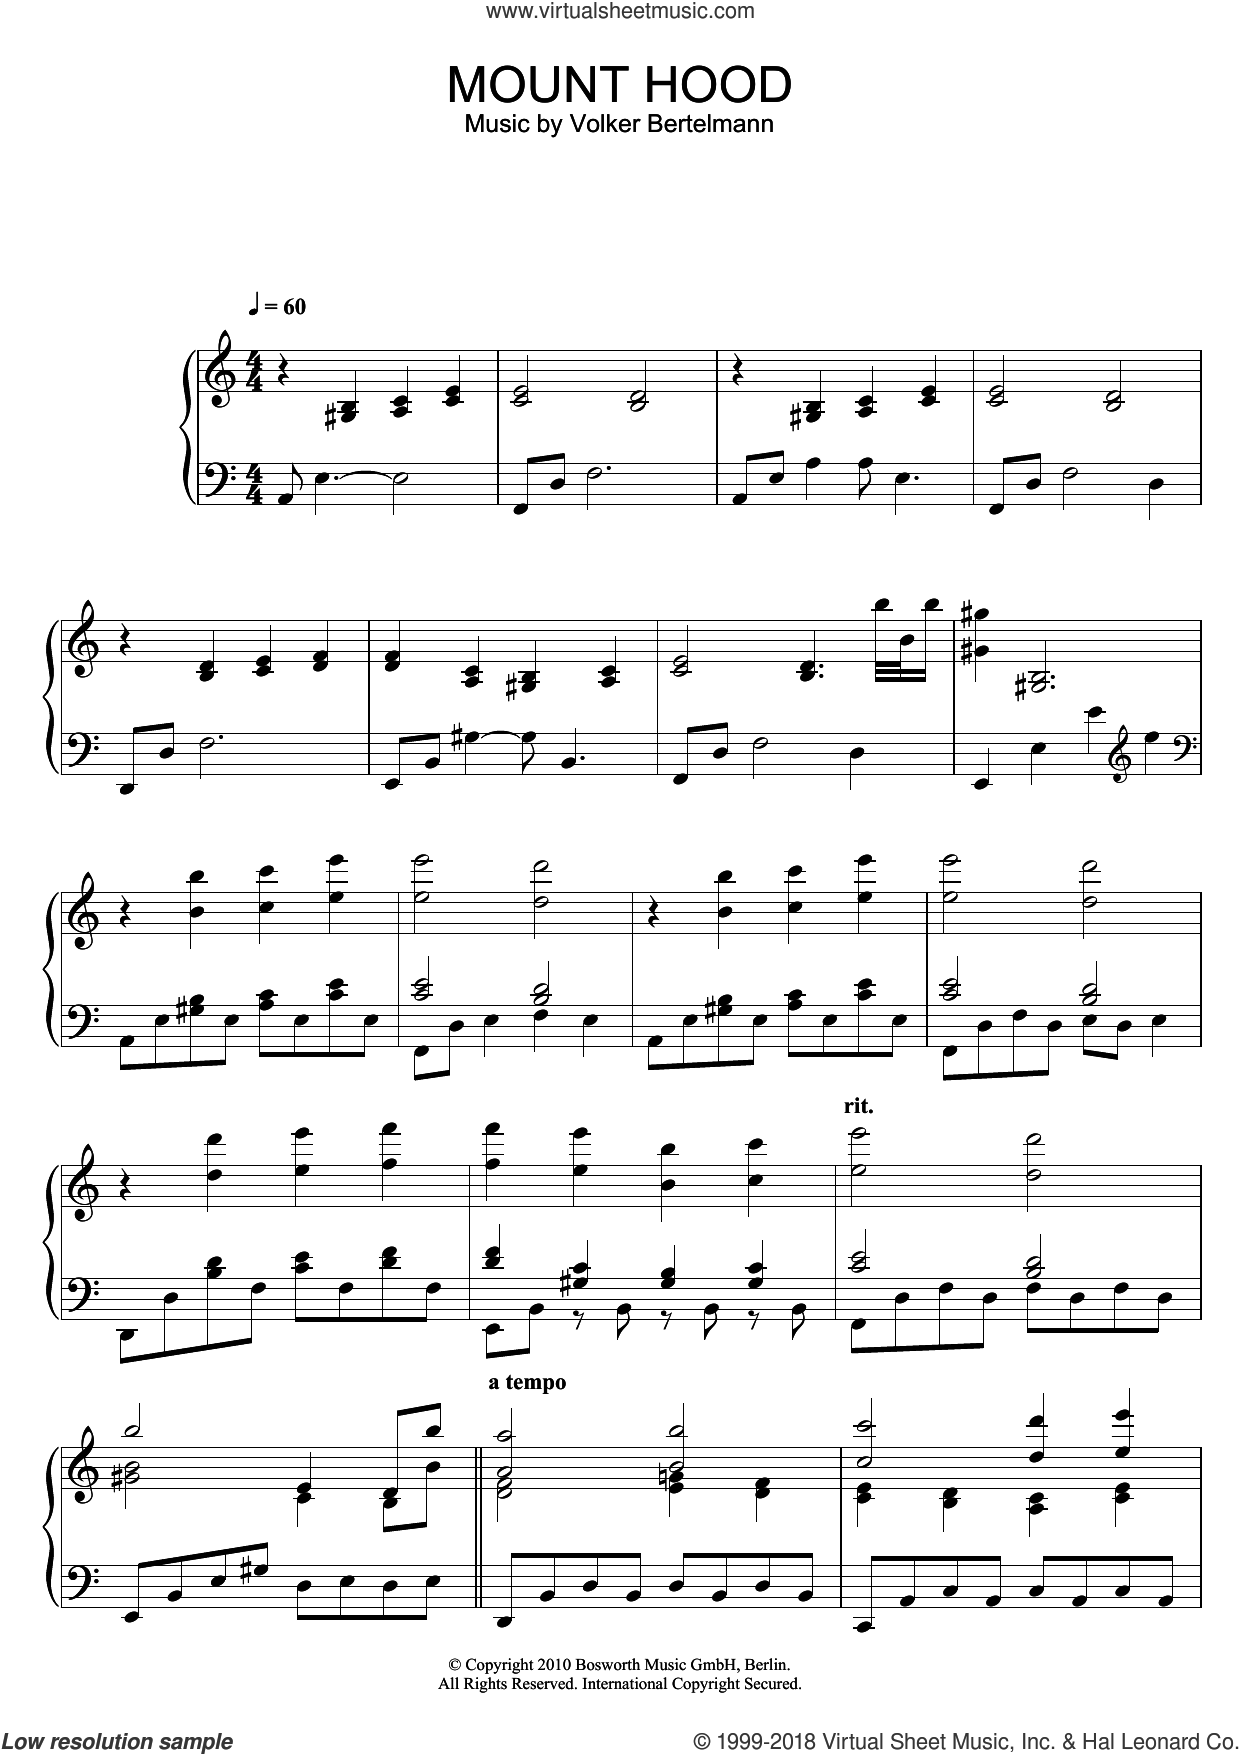 Mount Hood sheet music for piano solo by Hauschka and Volker Bertelmann, classical score, intermediate skill level